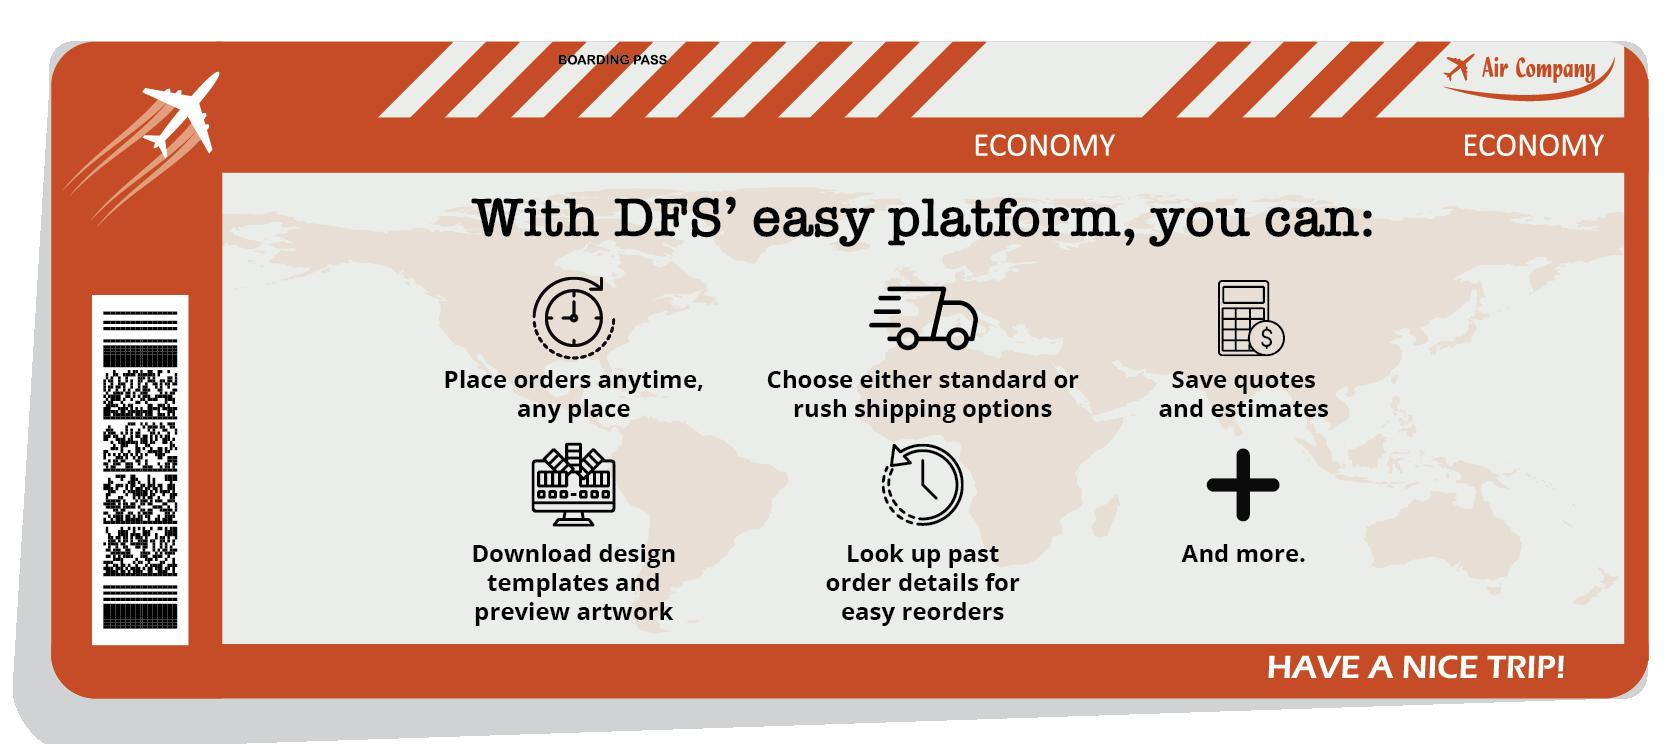 Capabilities when using DFS's platform